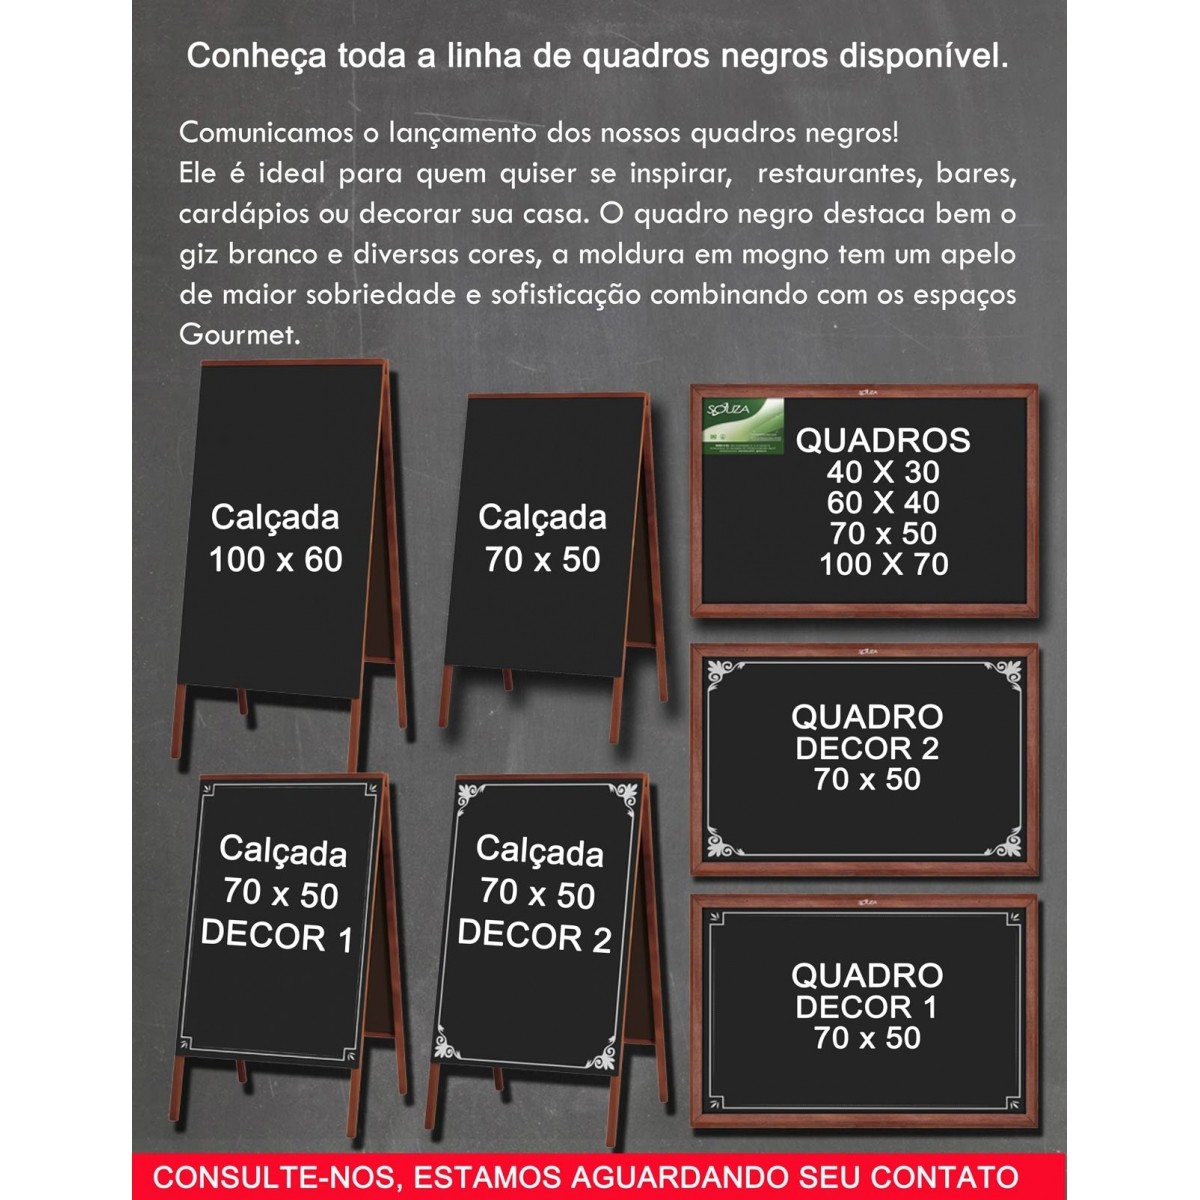 Quadro Negro 60 X 40 cm Moldura Cor MOGNO Referência 2102 SOUZA